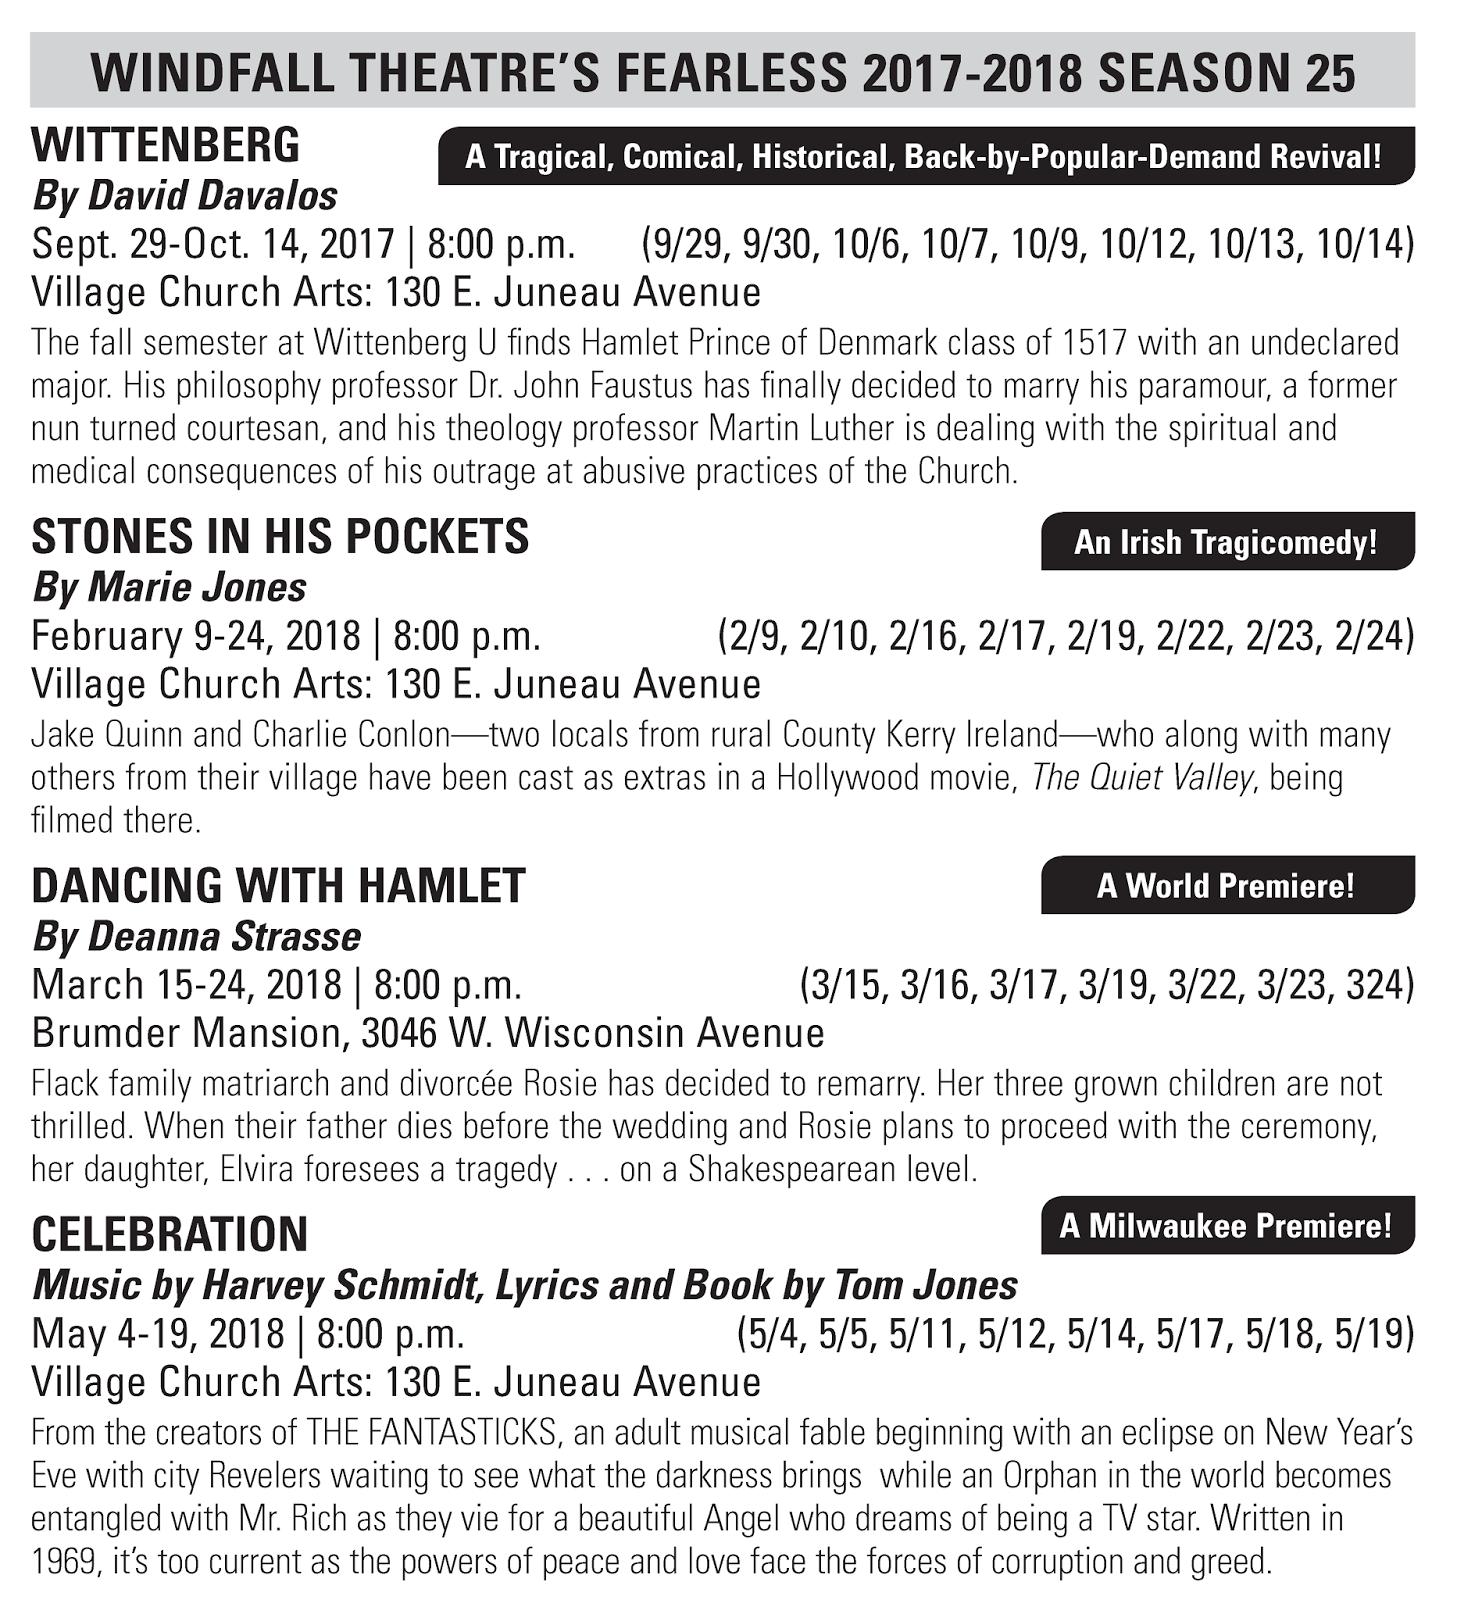 WINDFALL SEASON 25 CONTINUES - Windfall Theatre